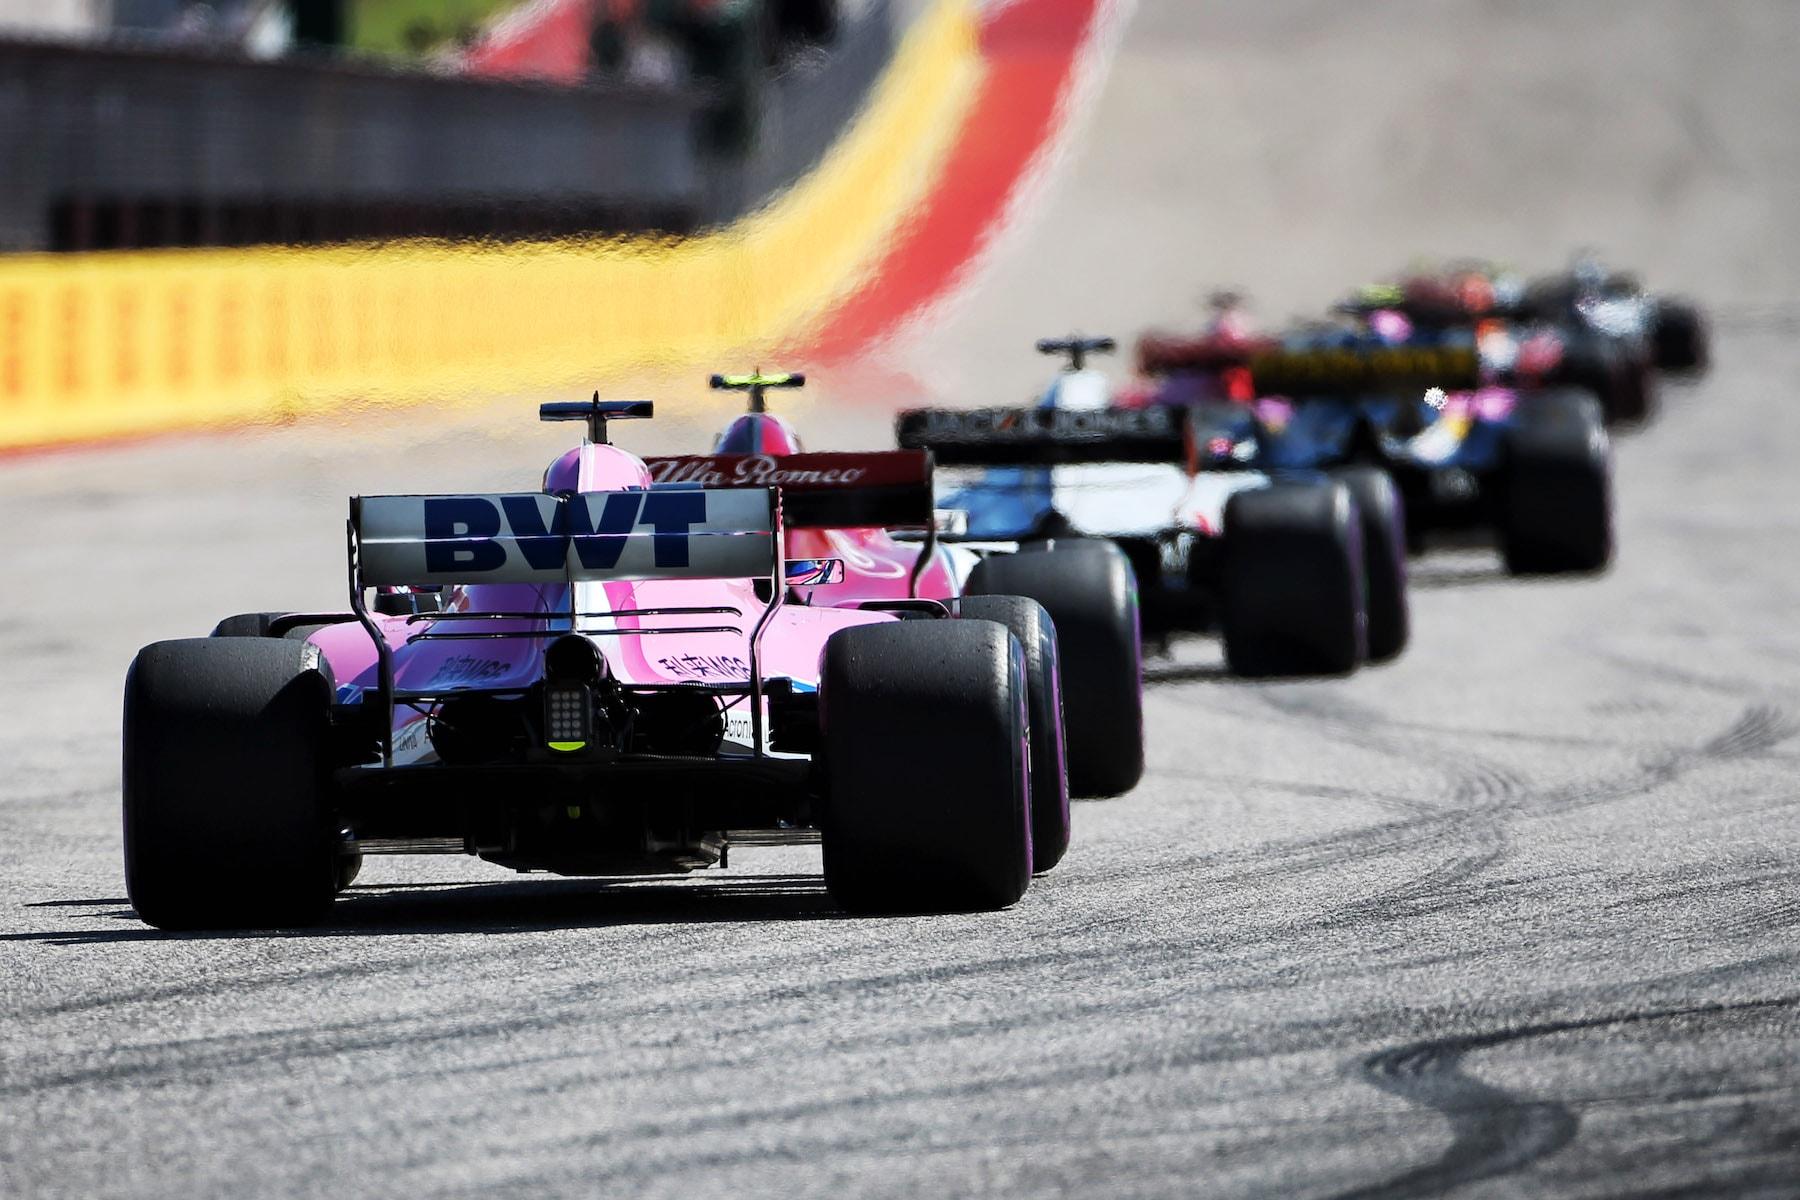 F 2018 Sergio Perez | Force India VJM11 | 2018 USGP 1 copy.jpg